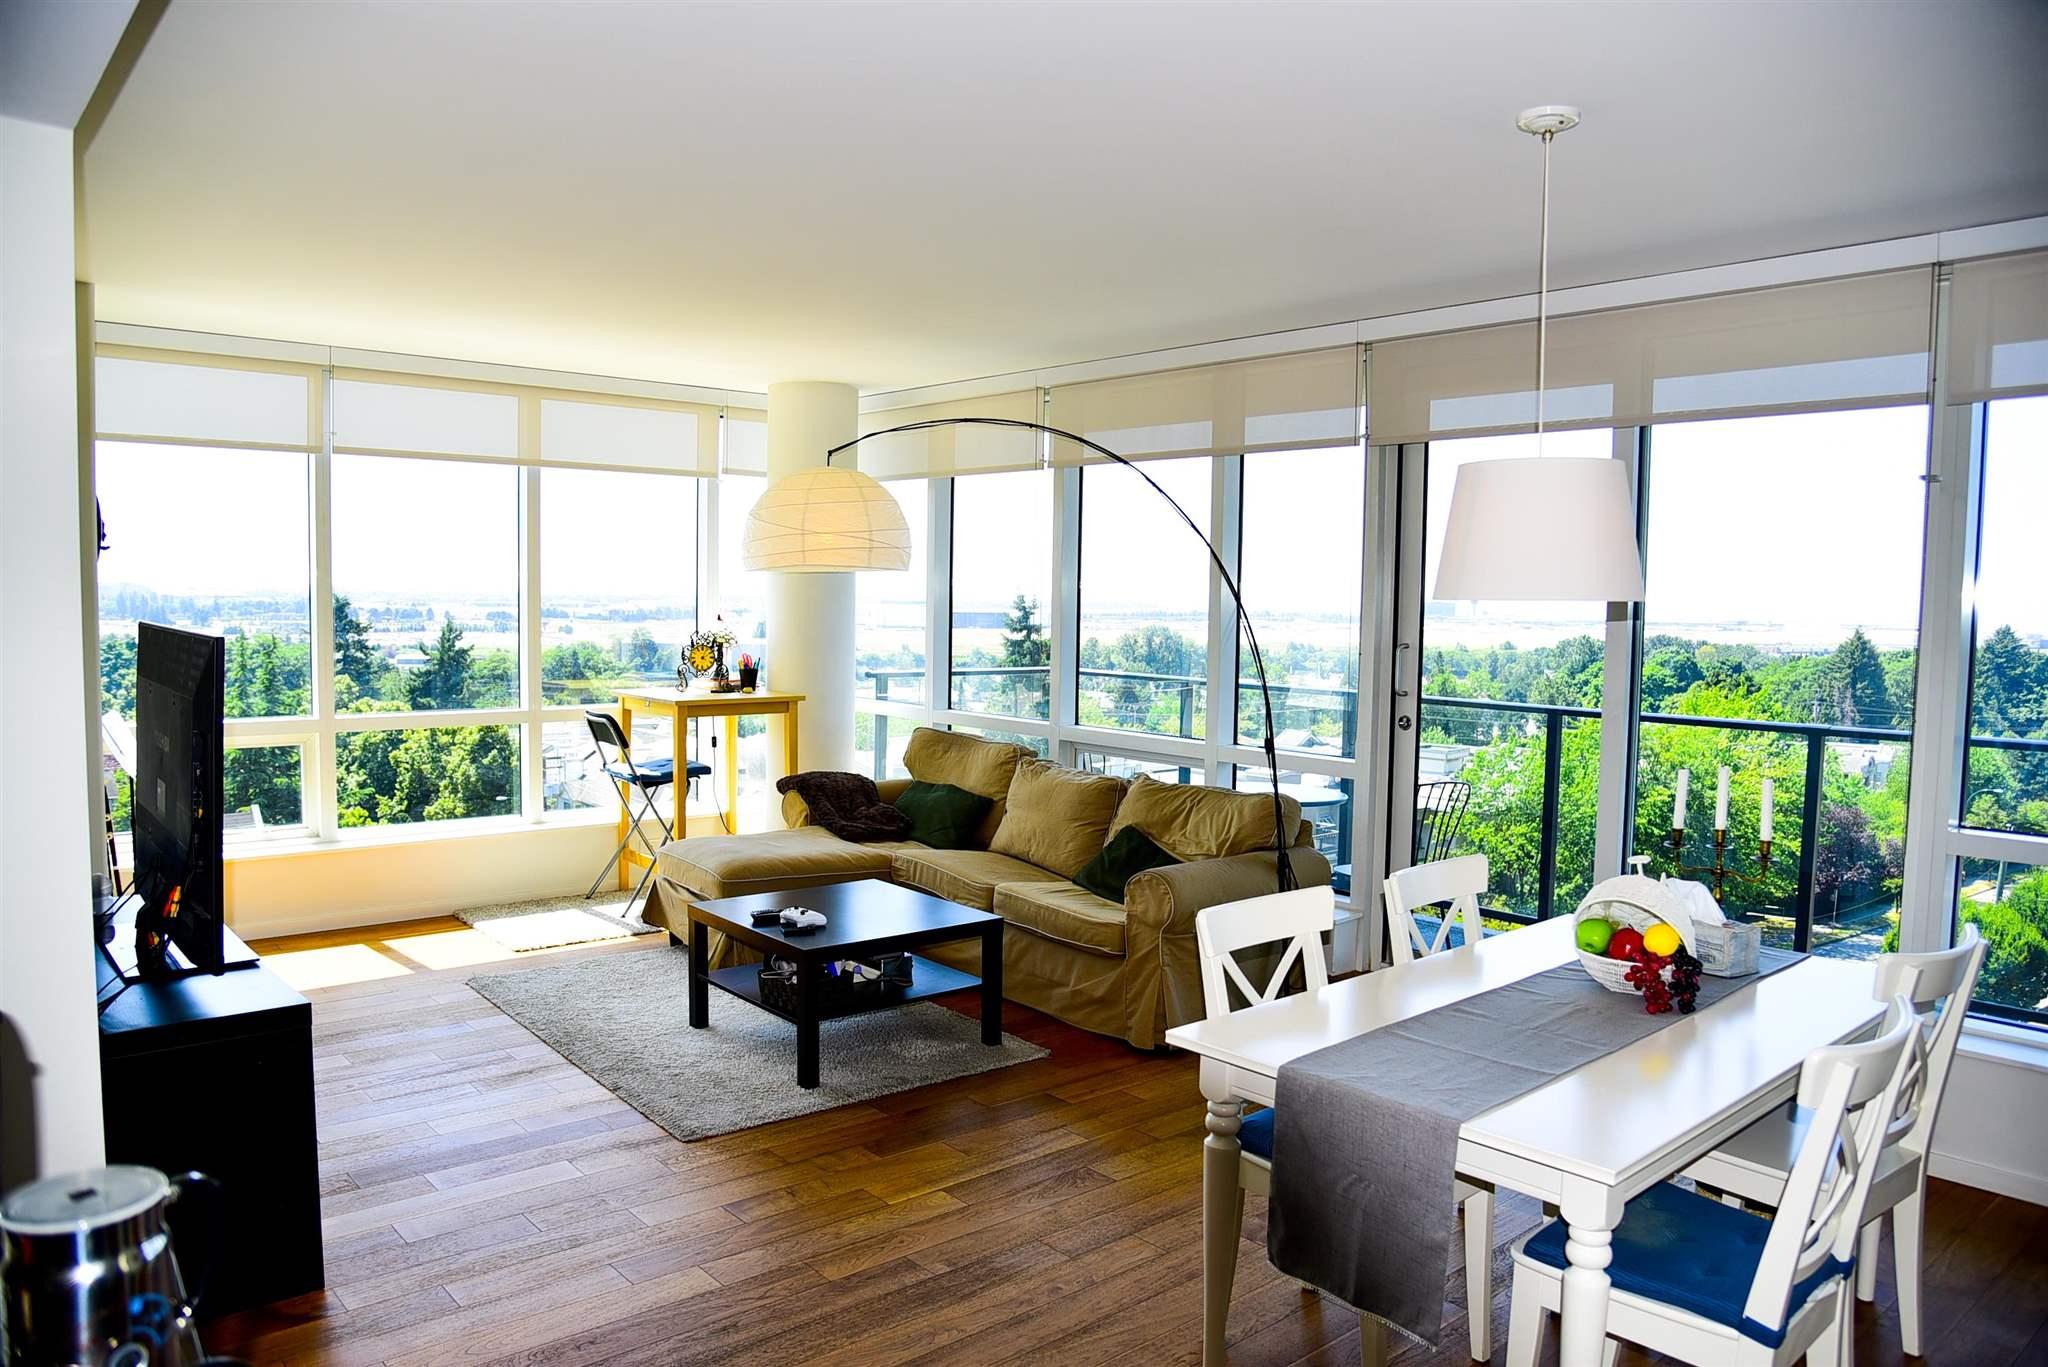 909 8588 CORNISH STREET - S.W. Marine Apartment/Condo for sale, 3 Bedrooms (R2600859)